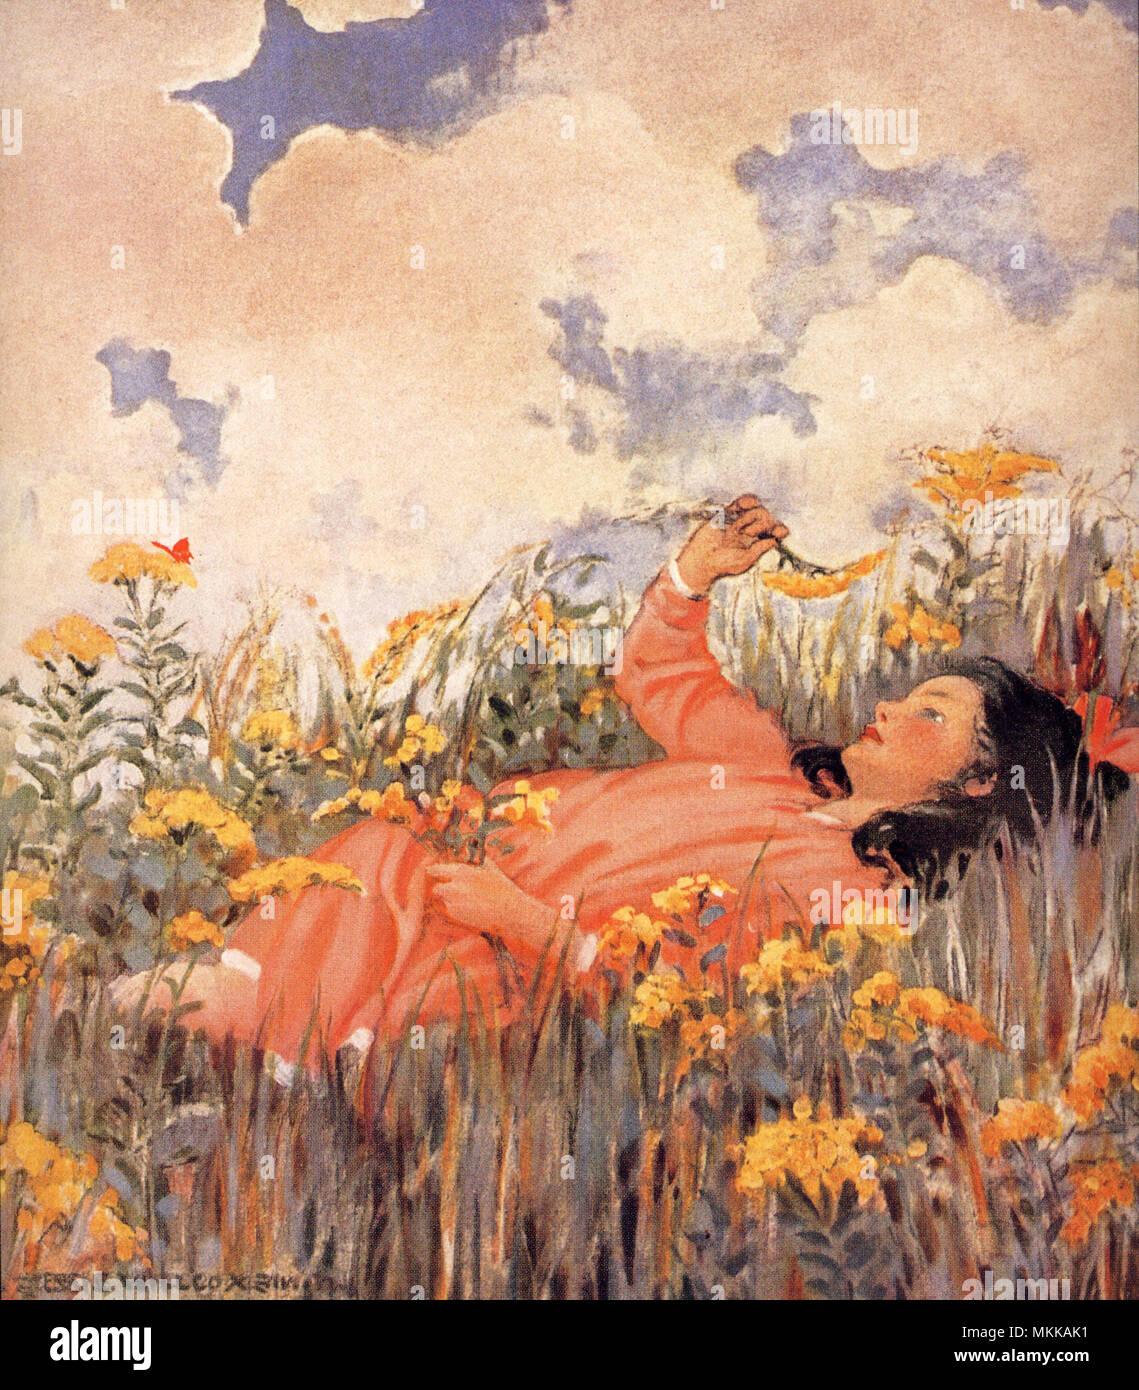 Girl Lying in Grass Stock Photo - Alamy